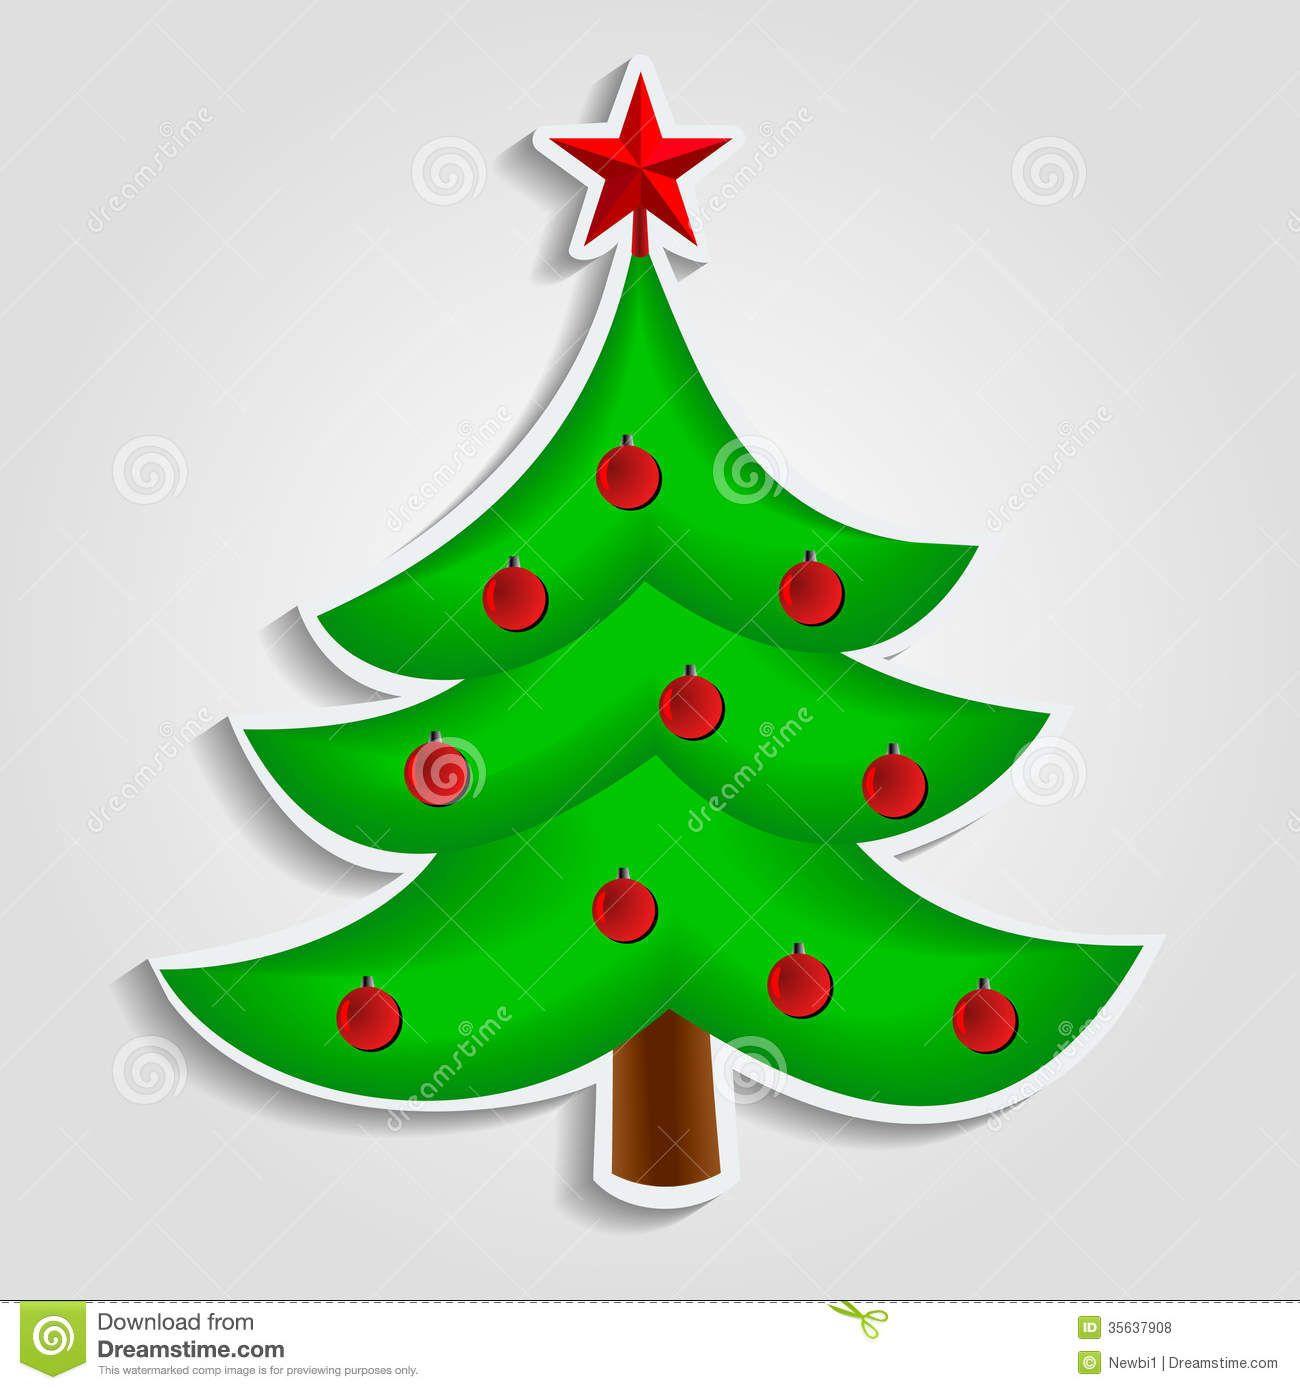 Flat Christmas Tree Design Stock Photos - Image: 33416933